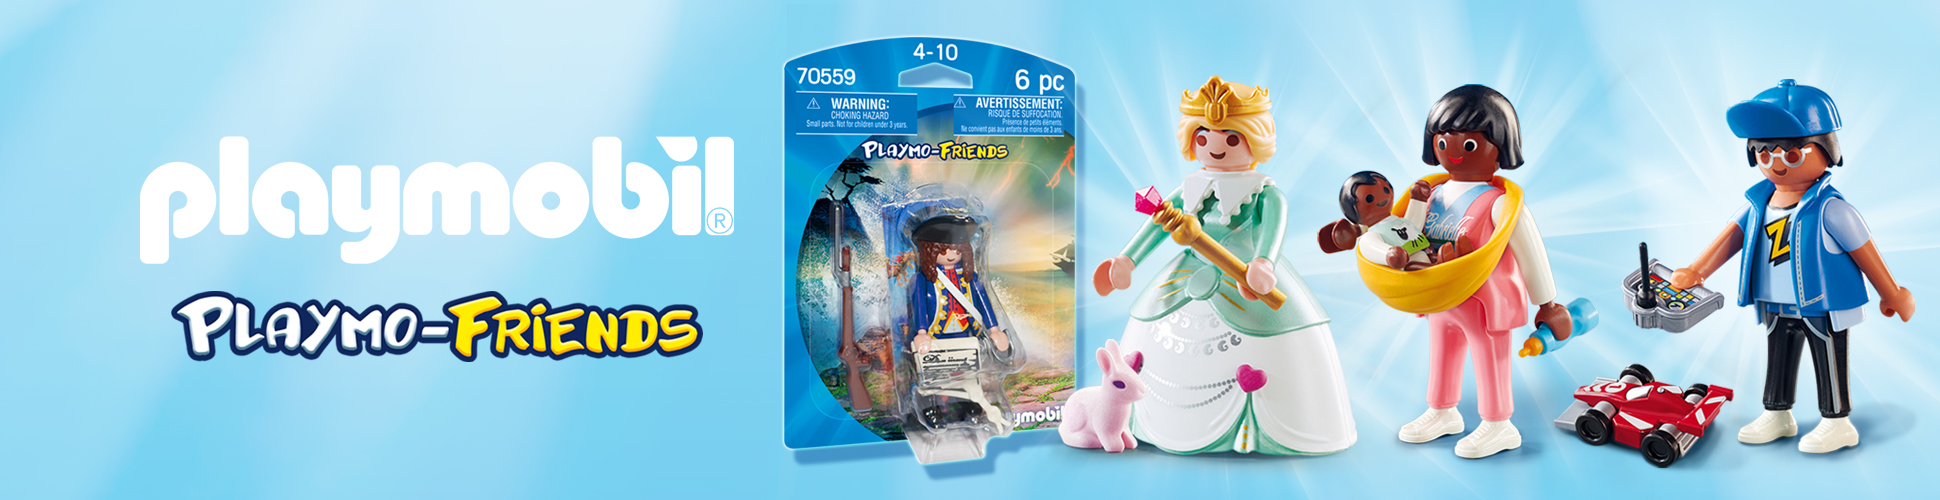 PlaymobilPlaymo-Friends